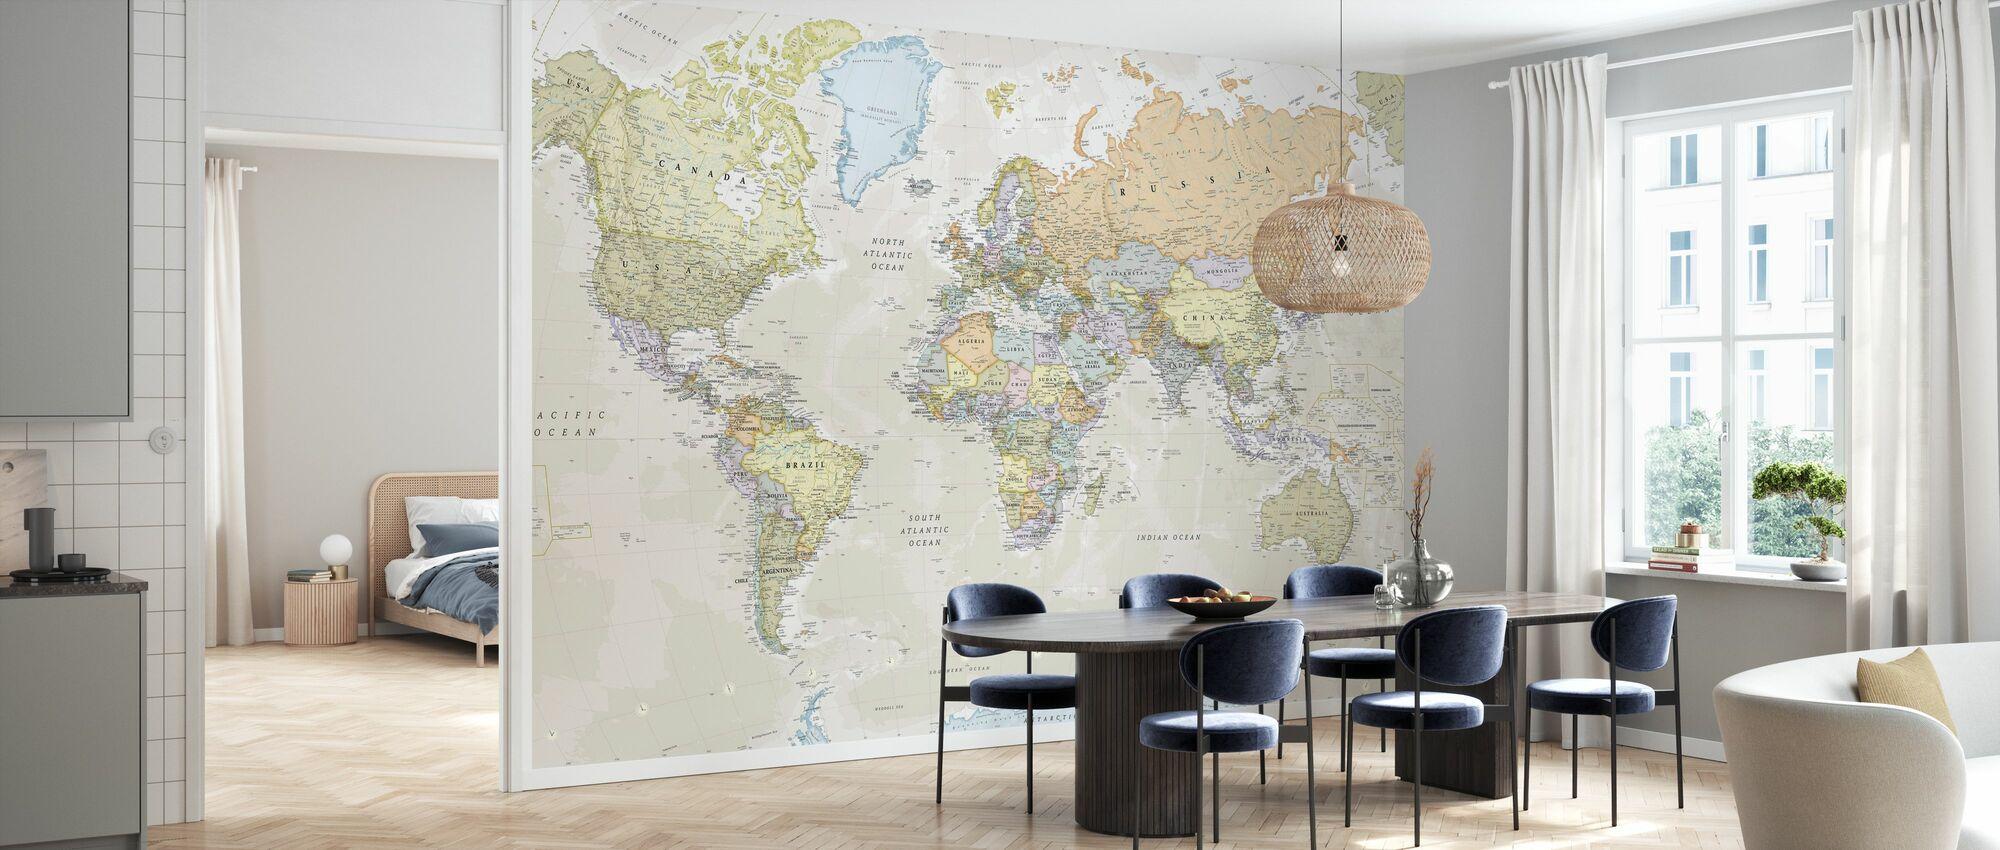 Classic World Map - Wallpaper - Kitchen